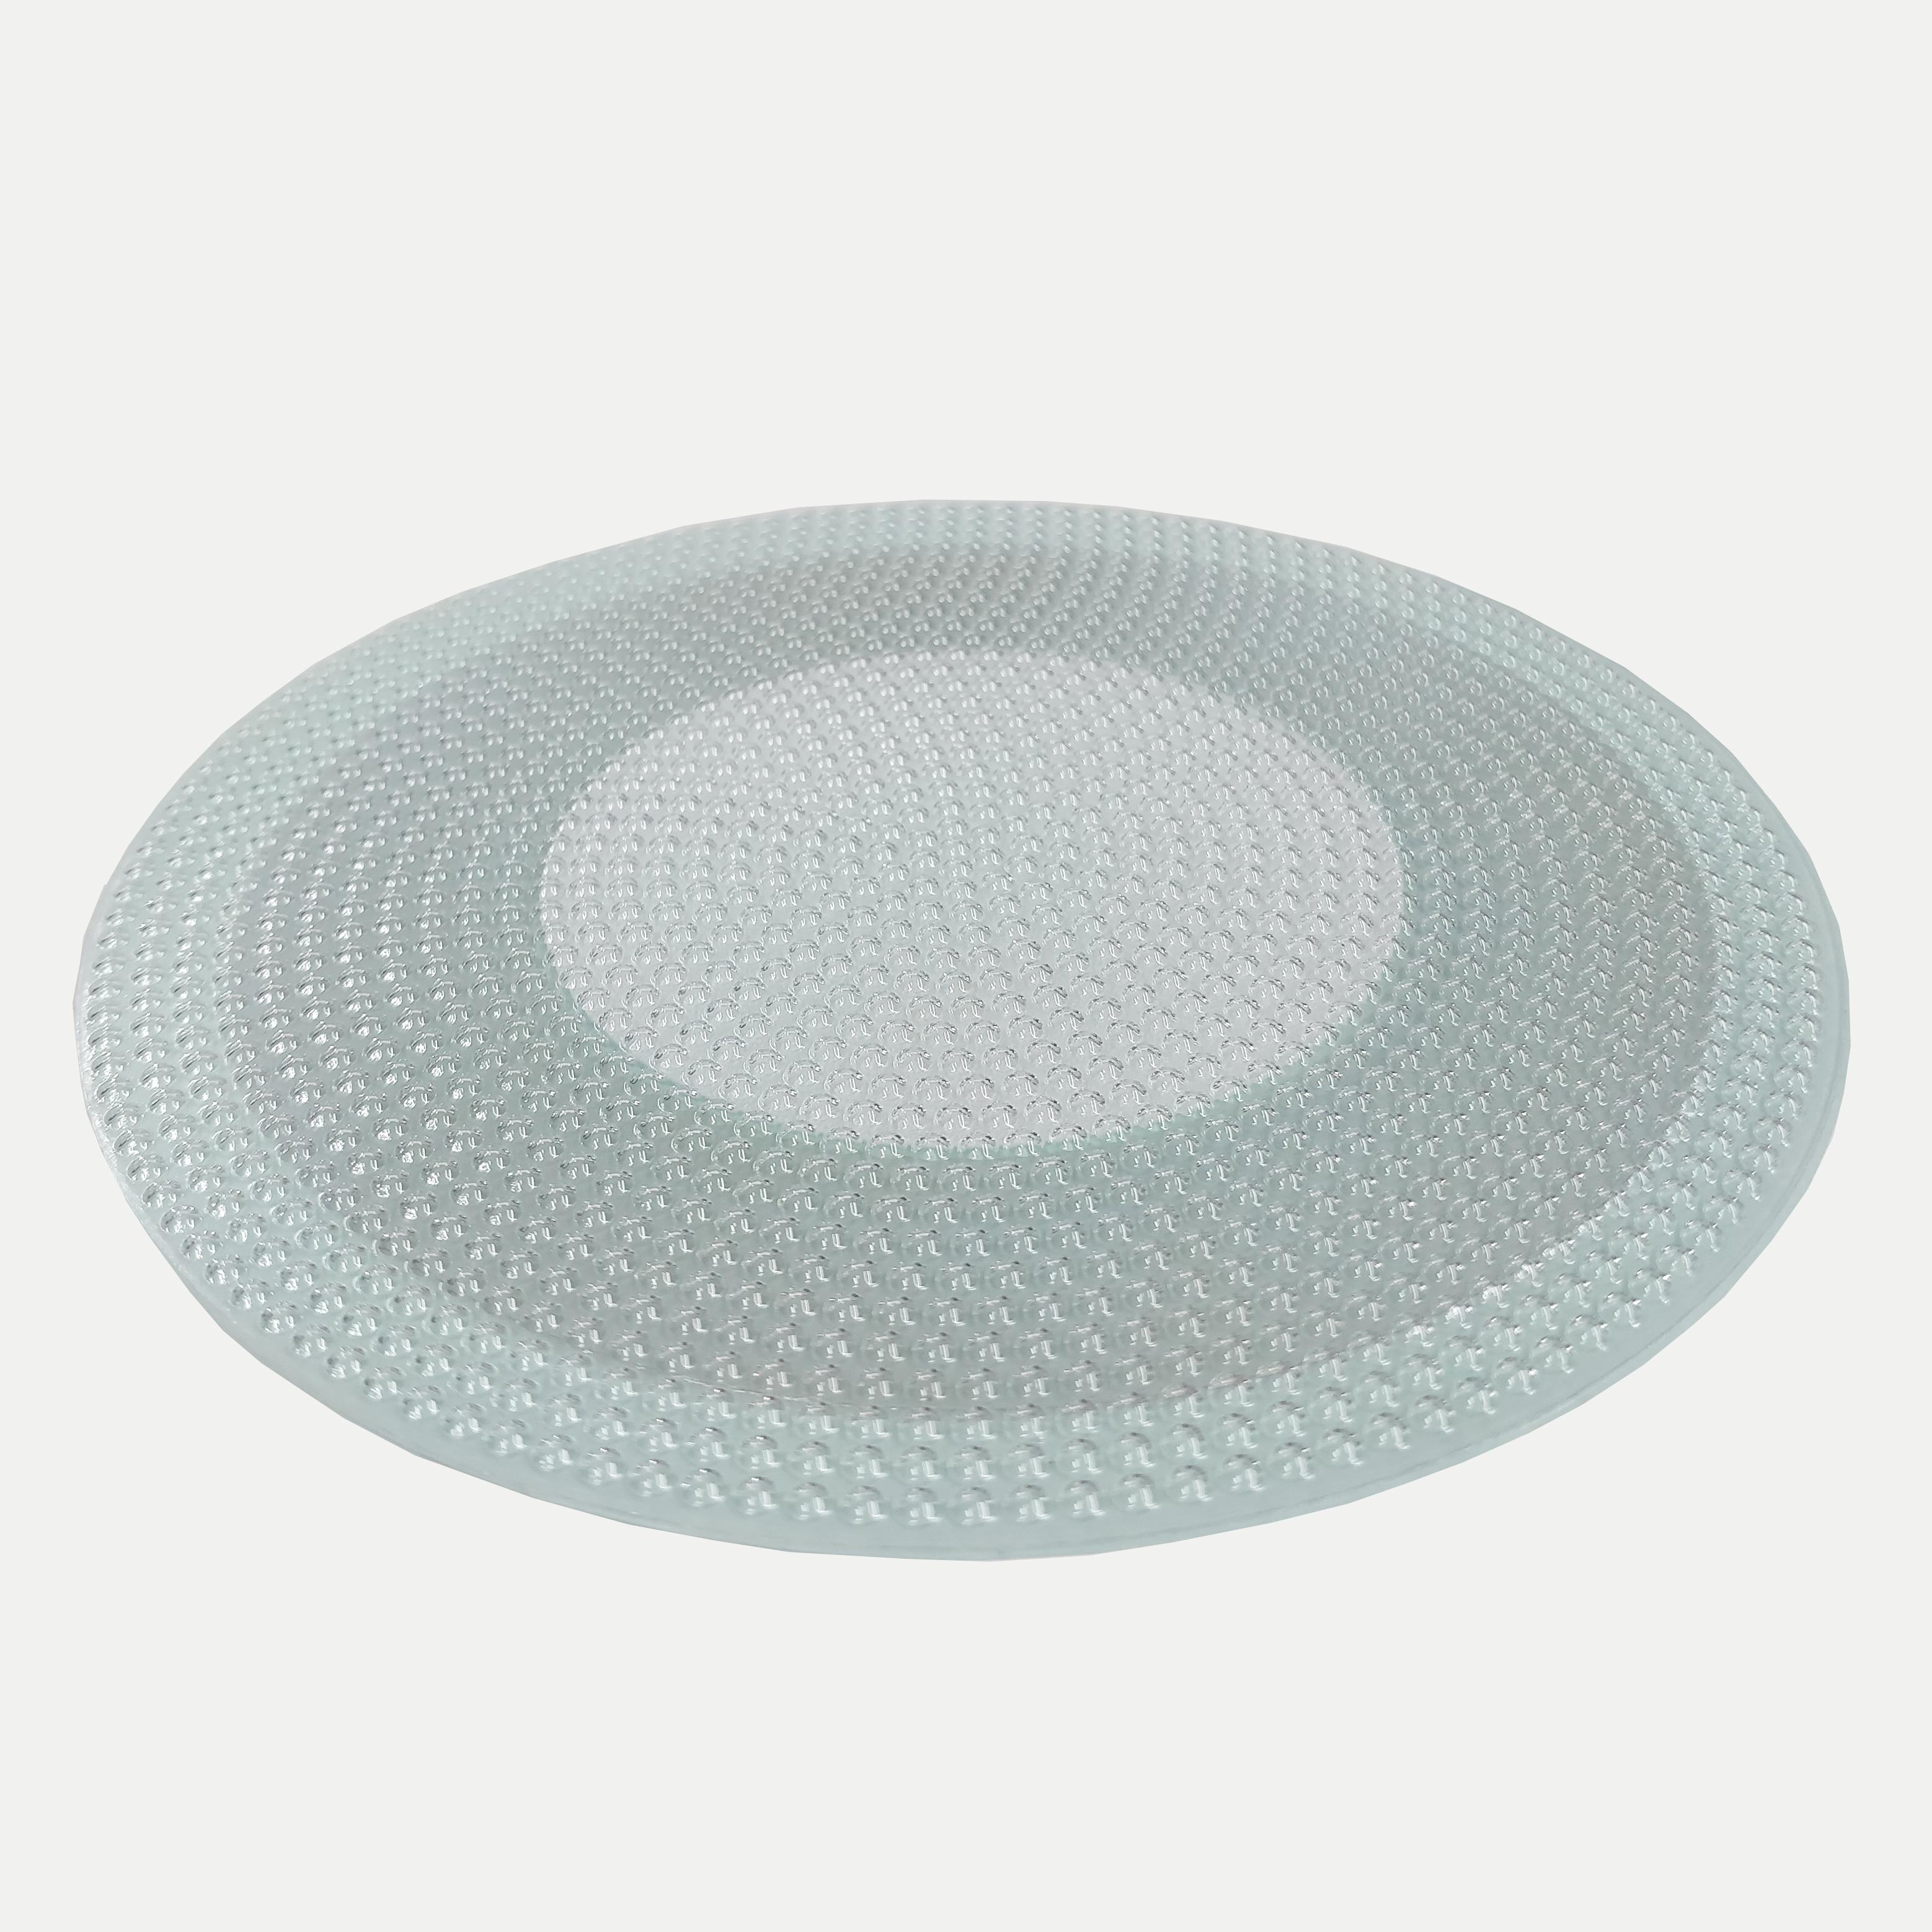 Replaceable Face for PVC Disk Baren